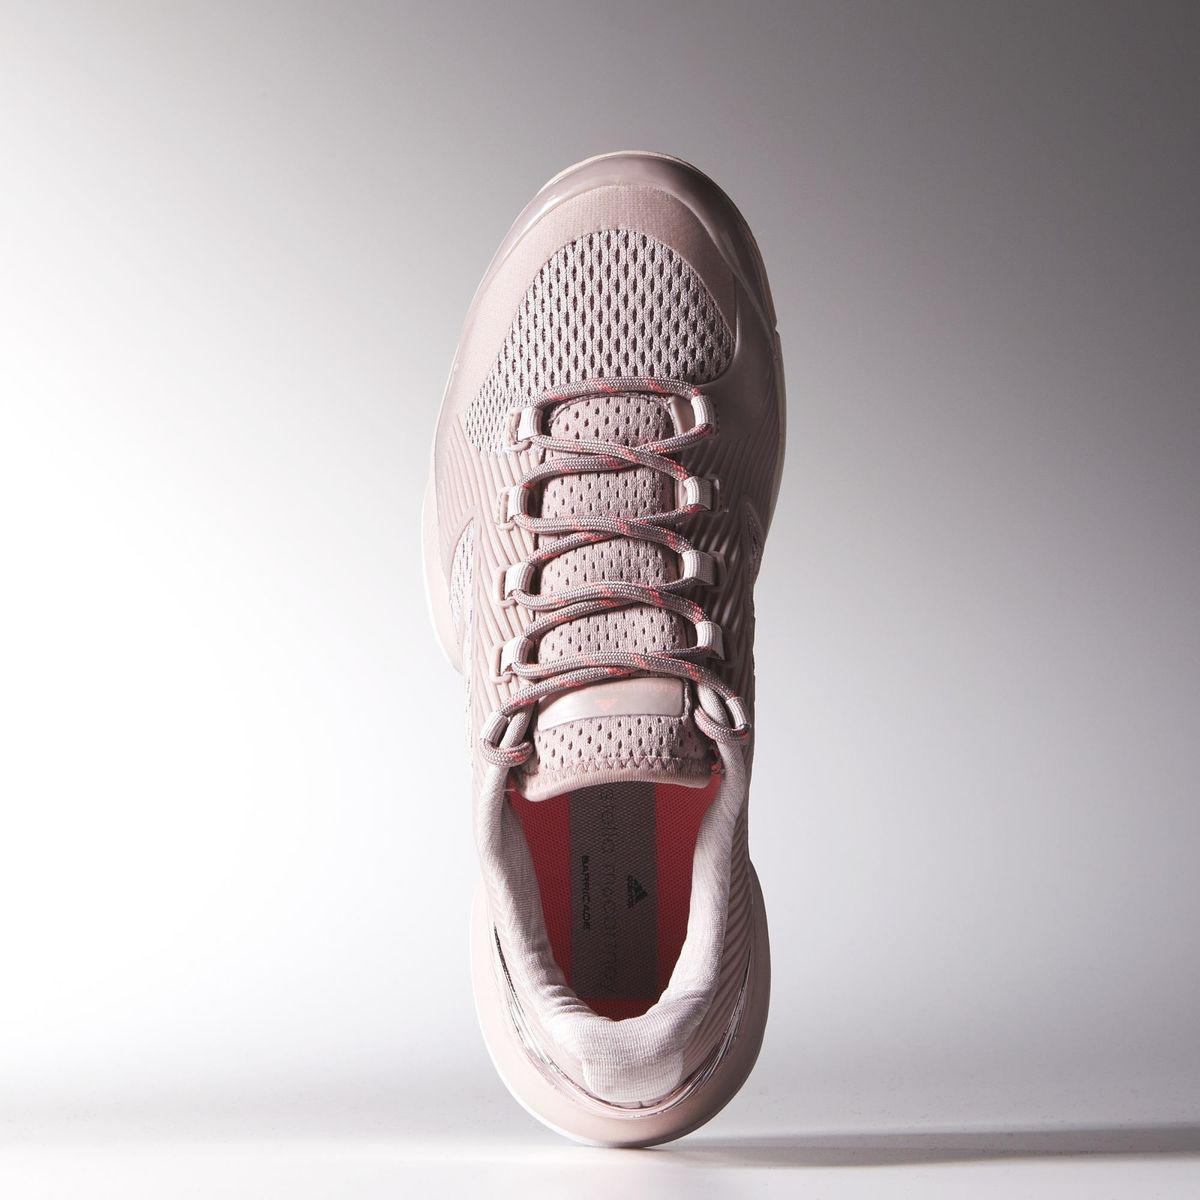 4bb771b0aed11 Adidas Womens Stella McCartney Barricade 2015 Tennis Shoes - Light Pink